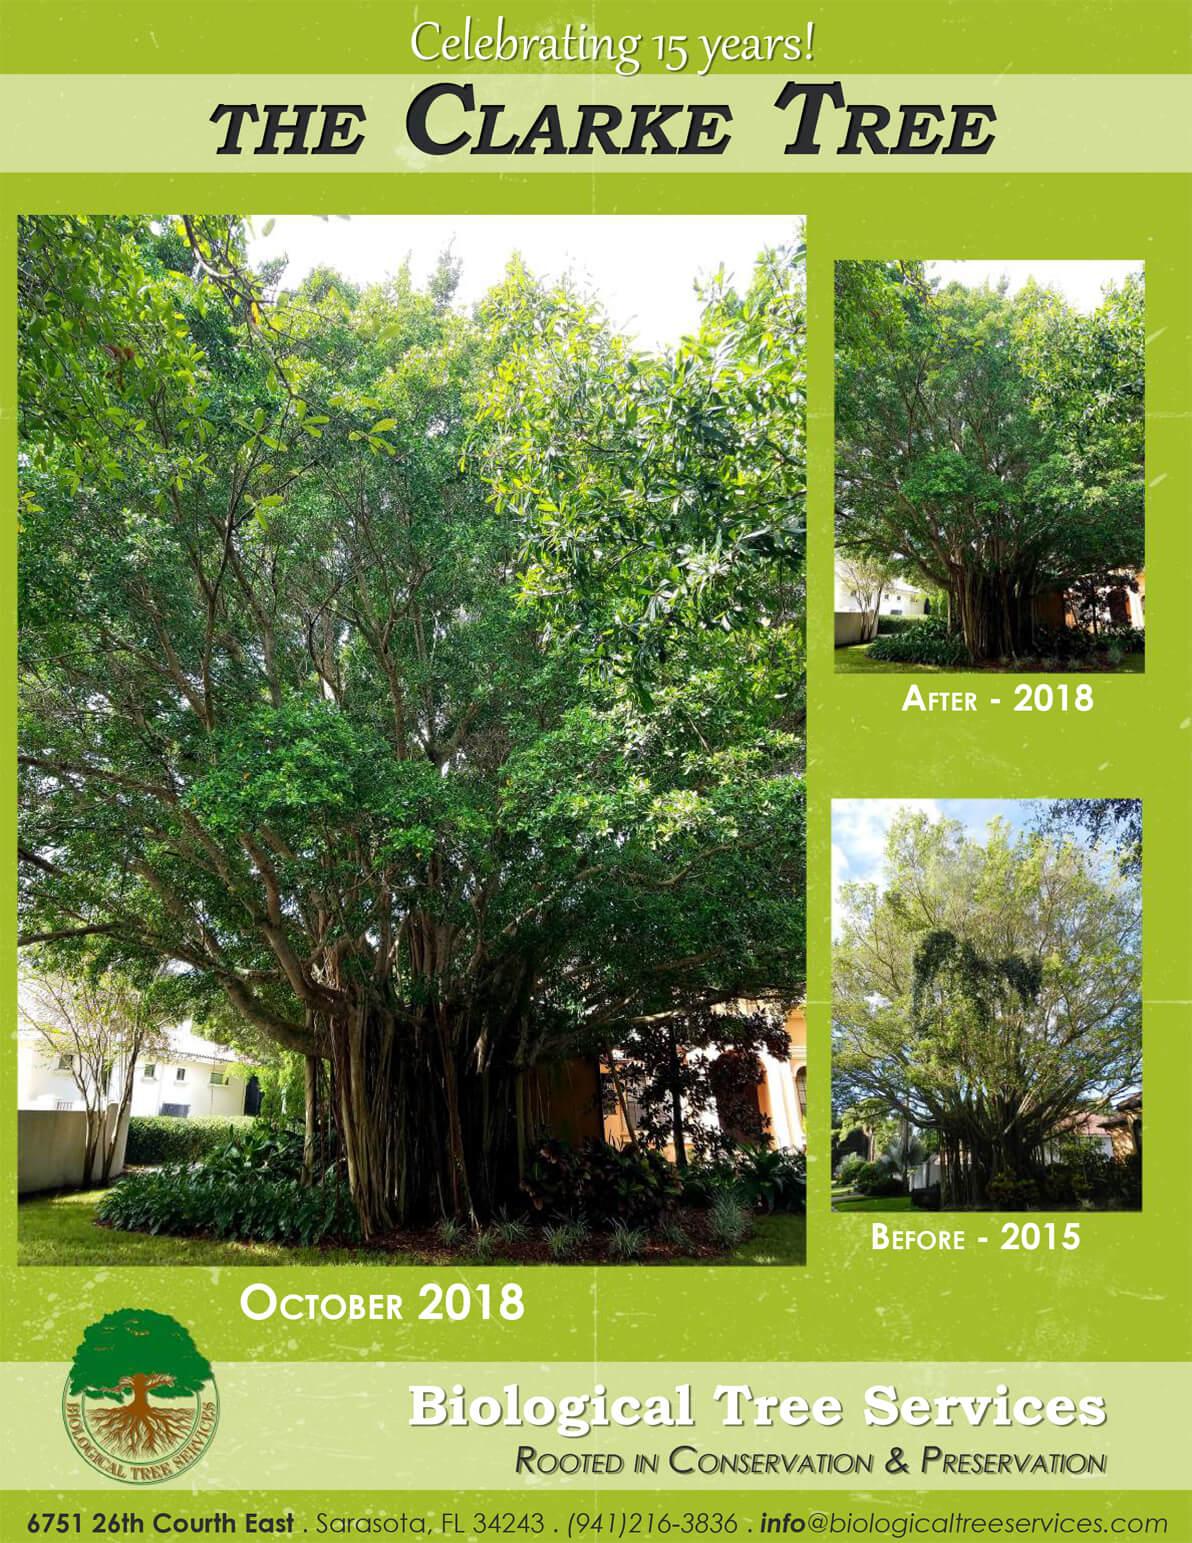 The Clarke Tree